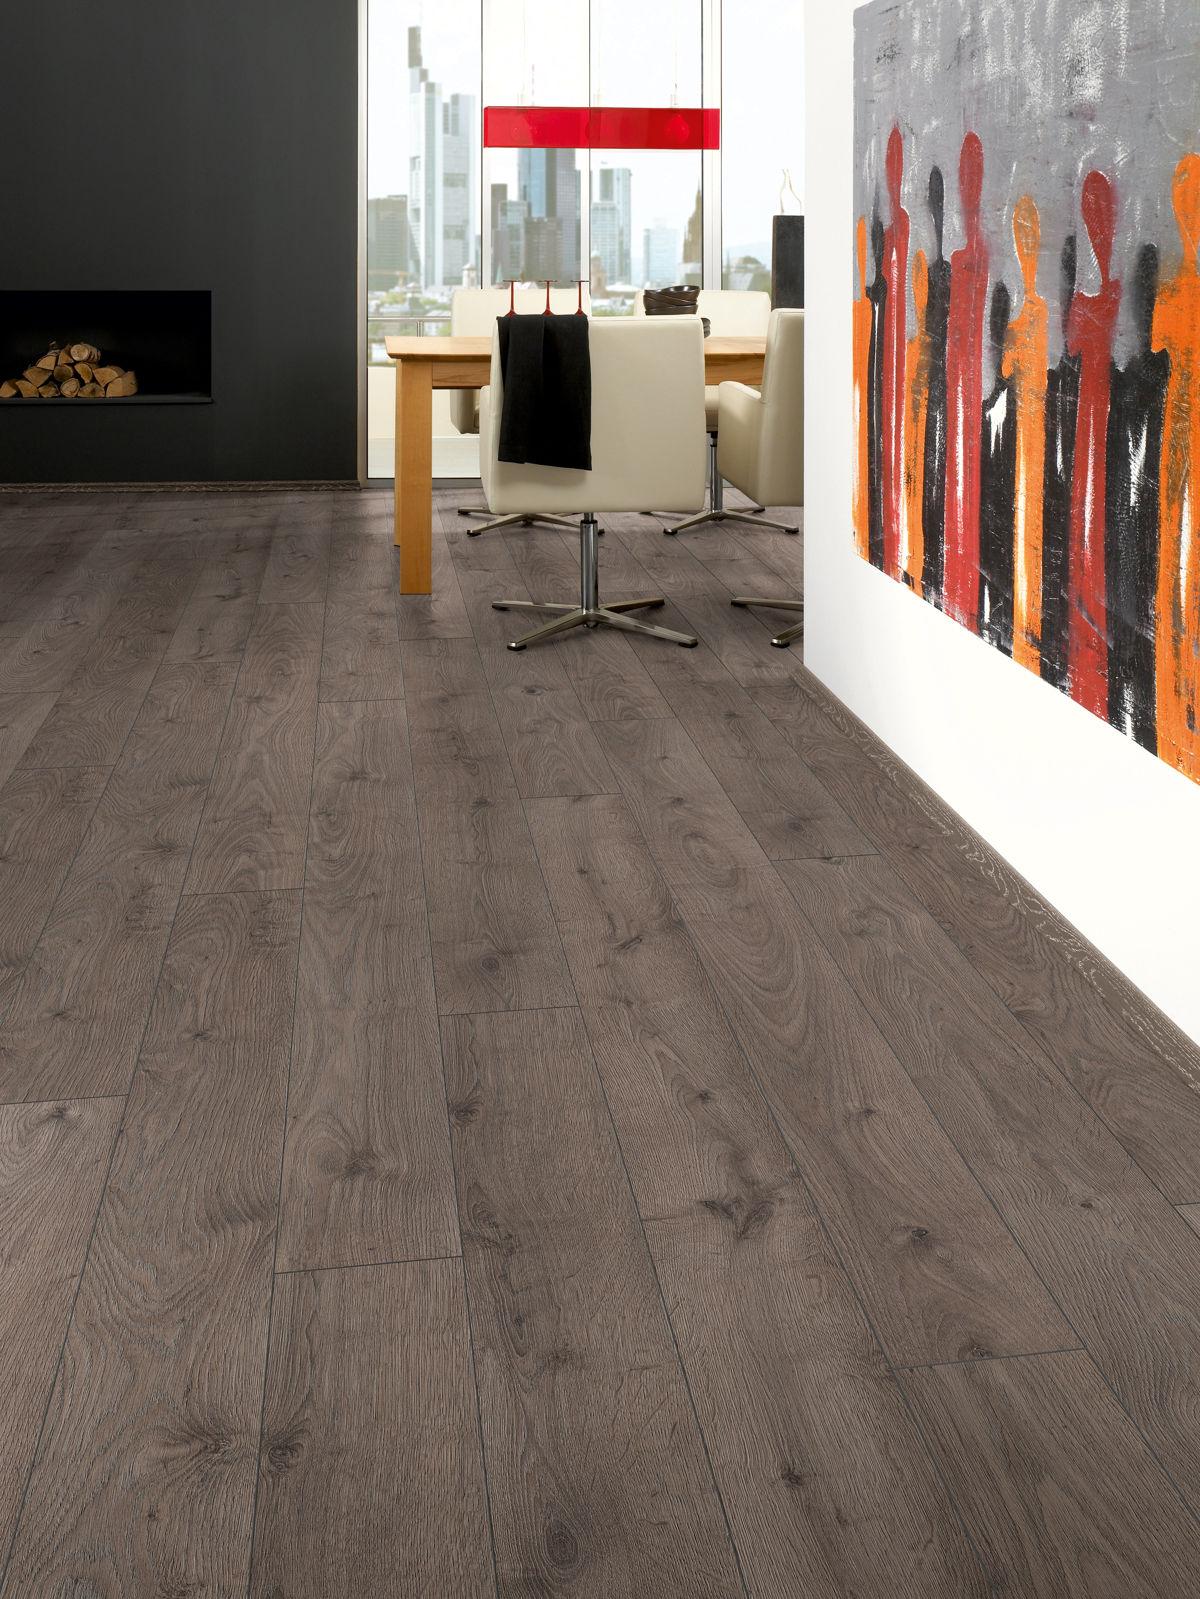 Kronospan vario san diego oak laminate flooring for Kronospan laminate flooring